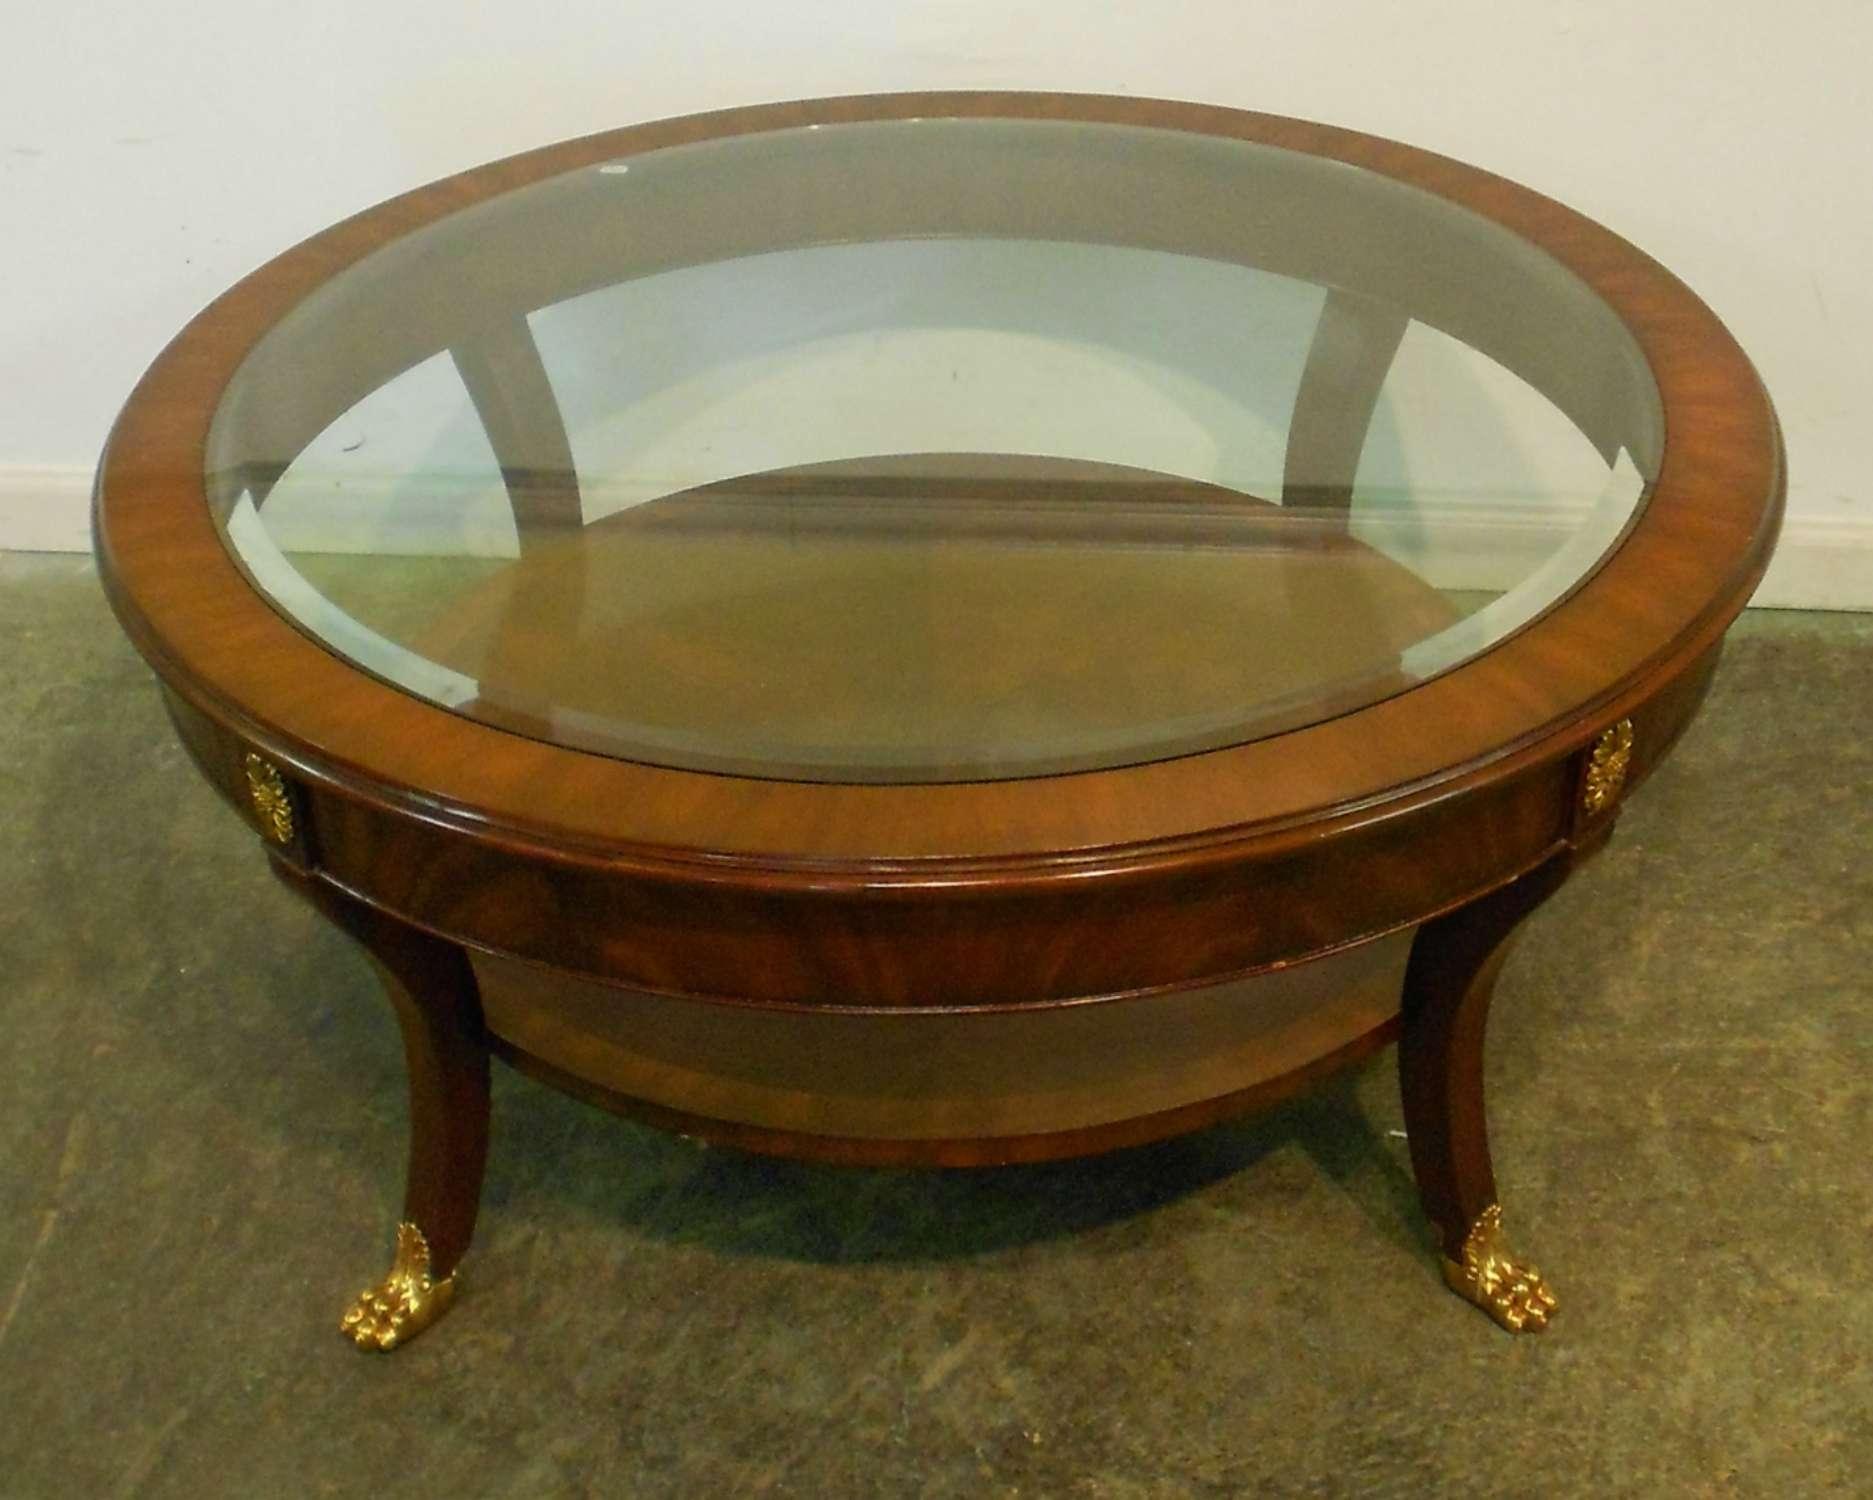 Round Wood Glass Coffee Table – Starrkingschool For Preferred Round Wood And Glass Coffee Tables (View 4 of 20)